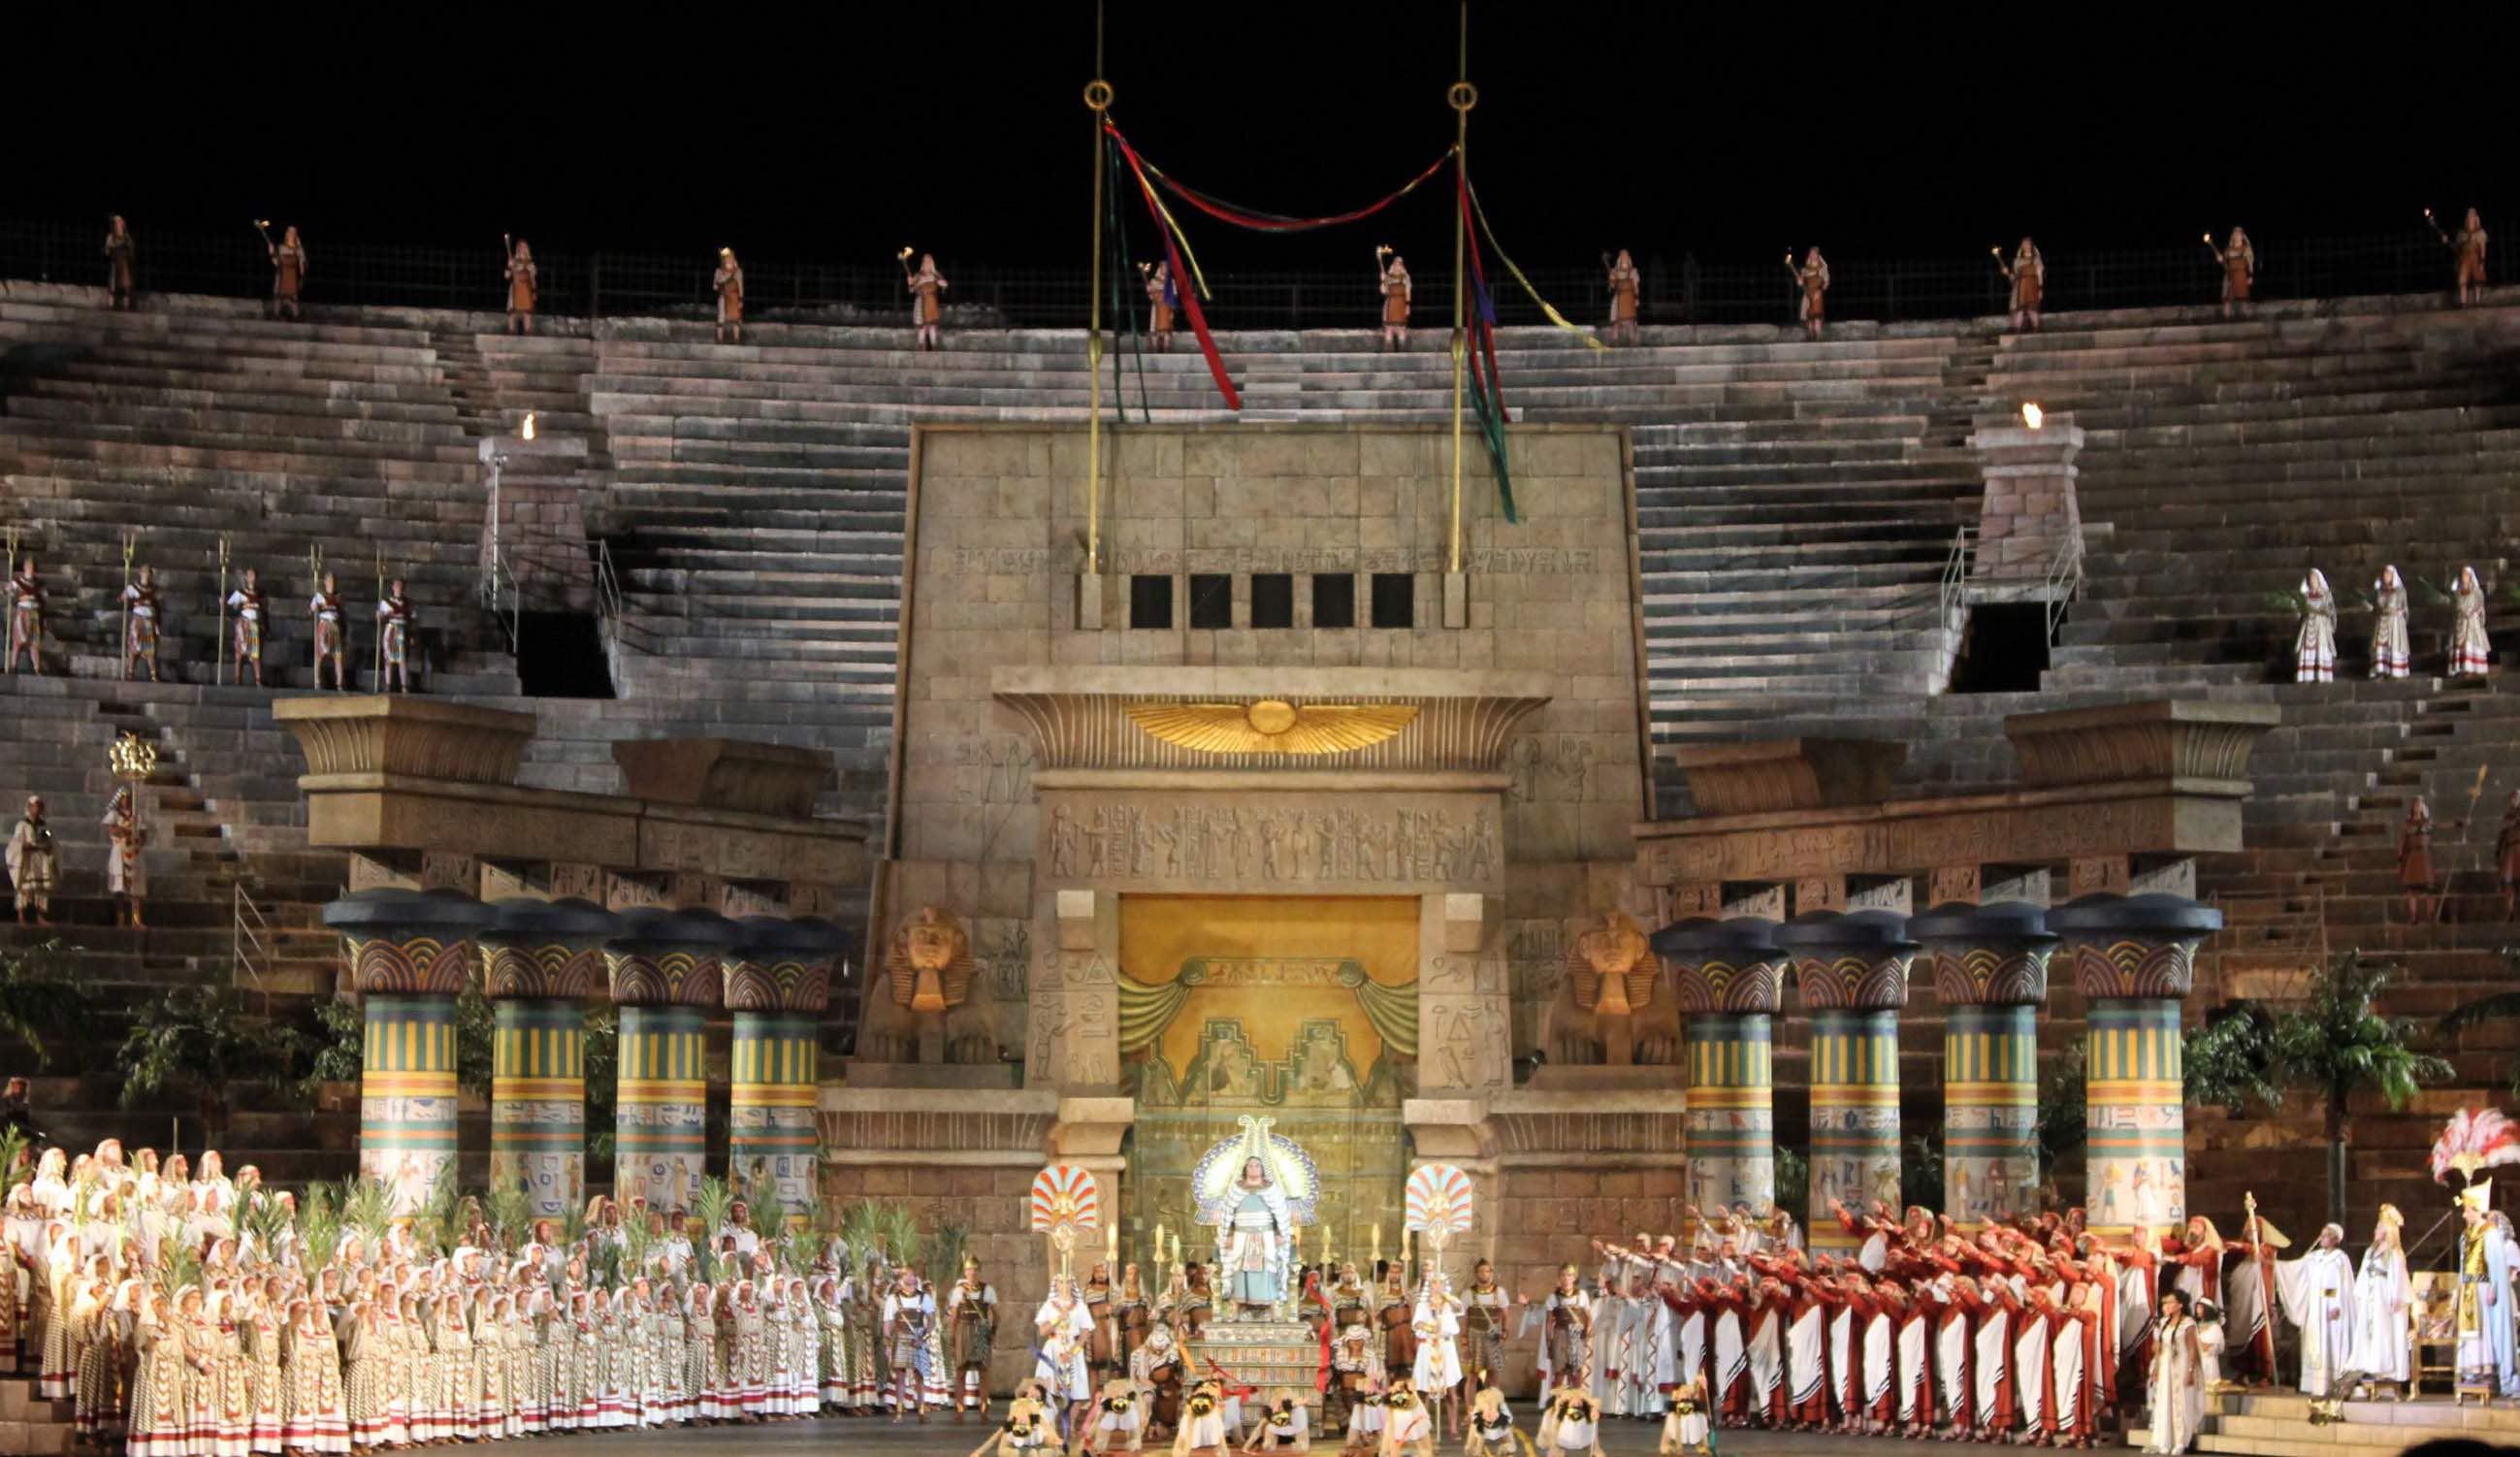 Aida, Verona, Arena di Verona, Arena, Giuseppe Verdi, Maria José Siri